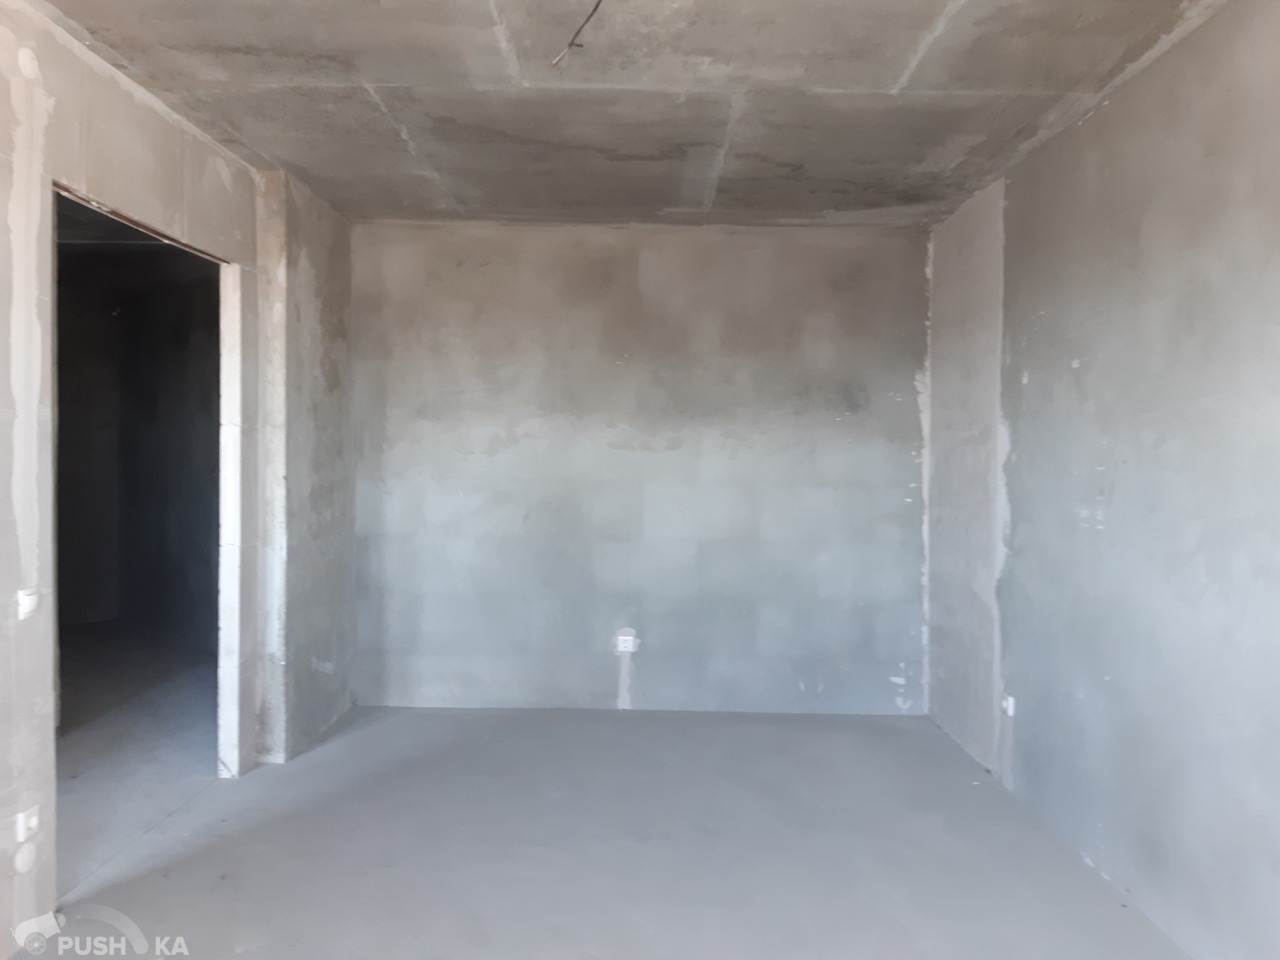 Продаётся 1-комнатная квартира 46.0 кв.м. этаж 10/15 за 1 750 000 руб